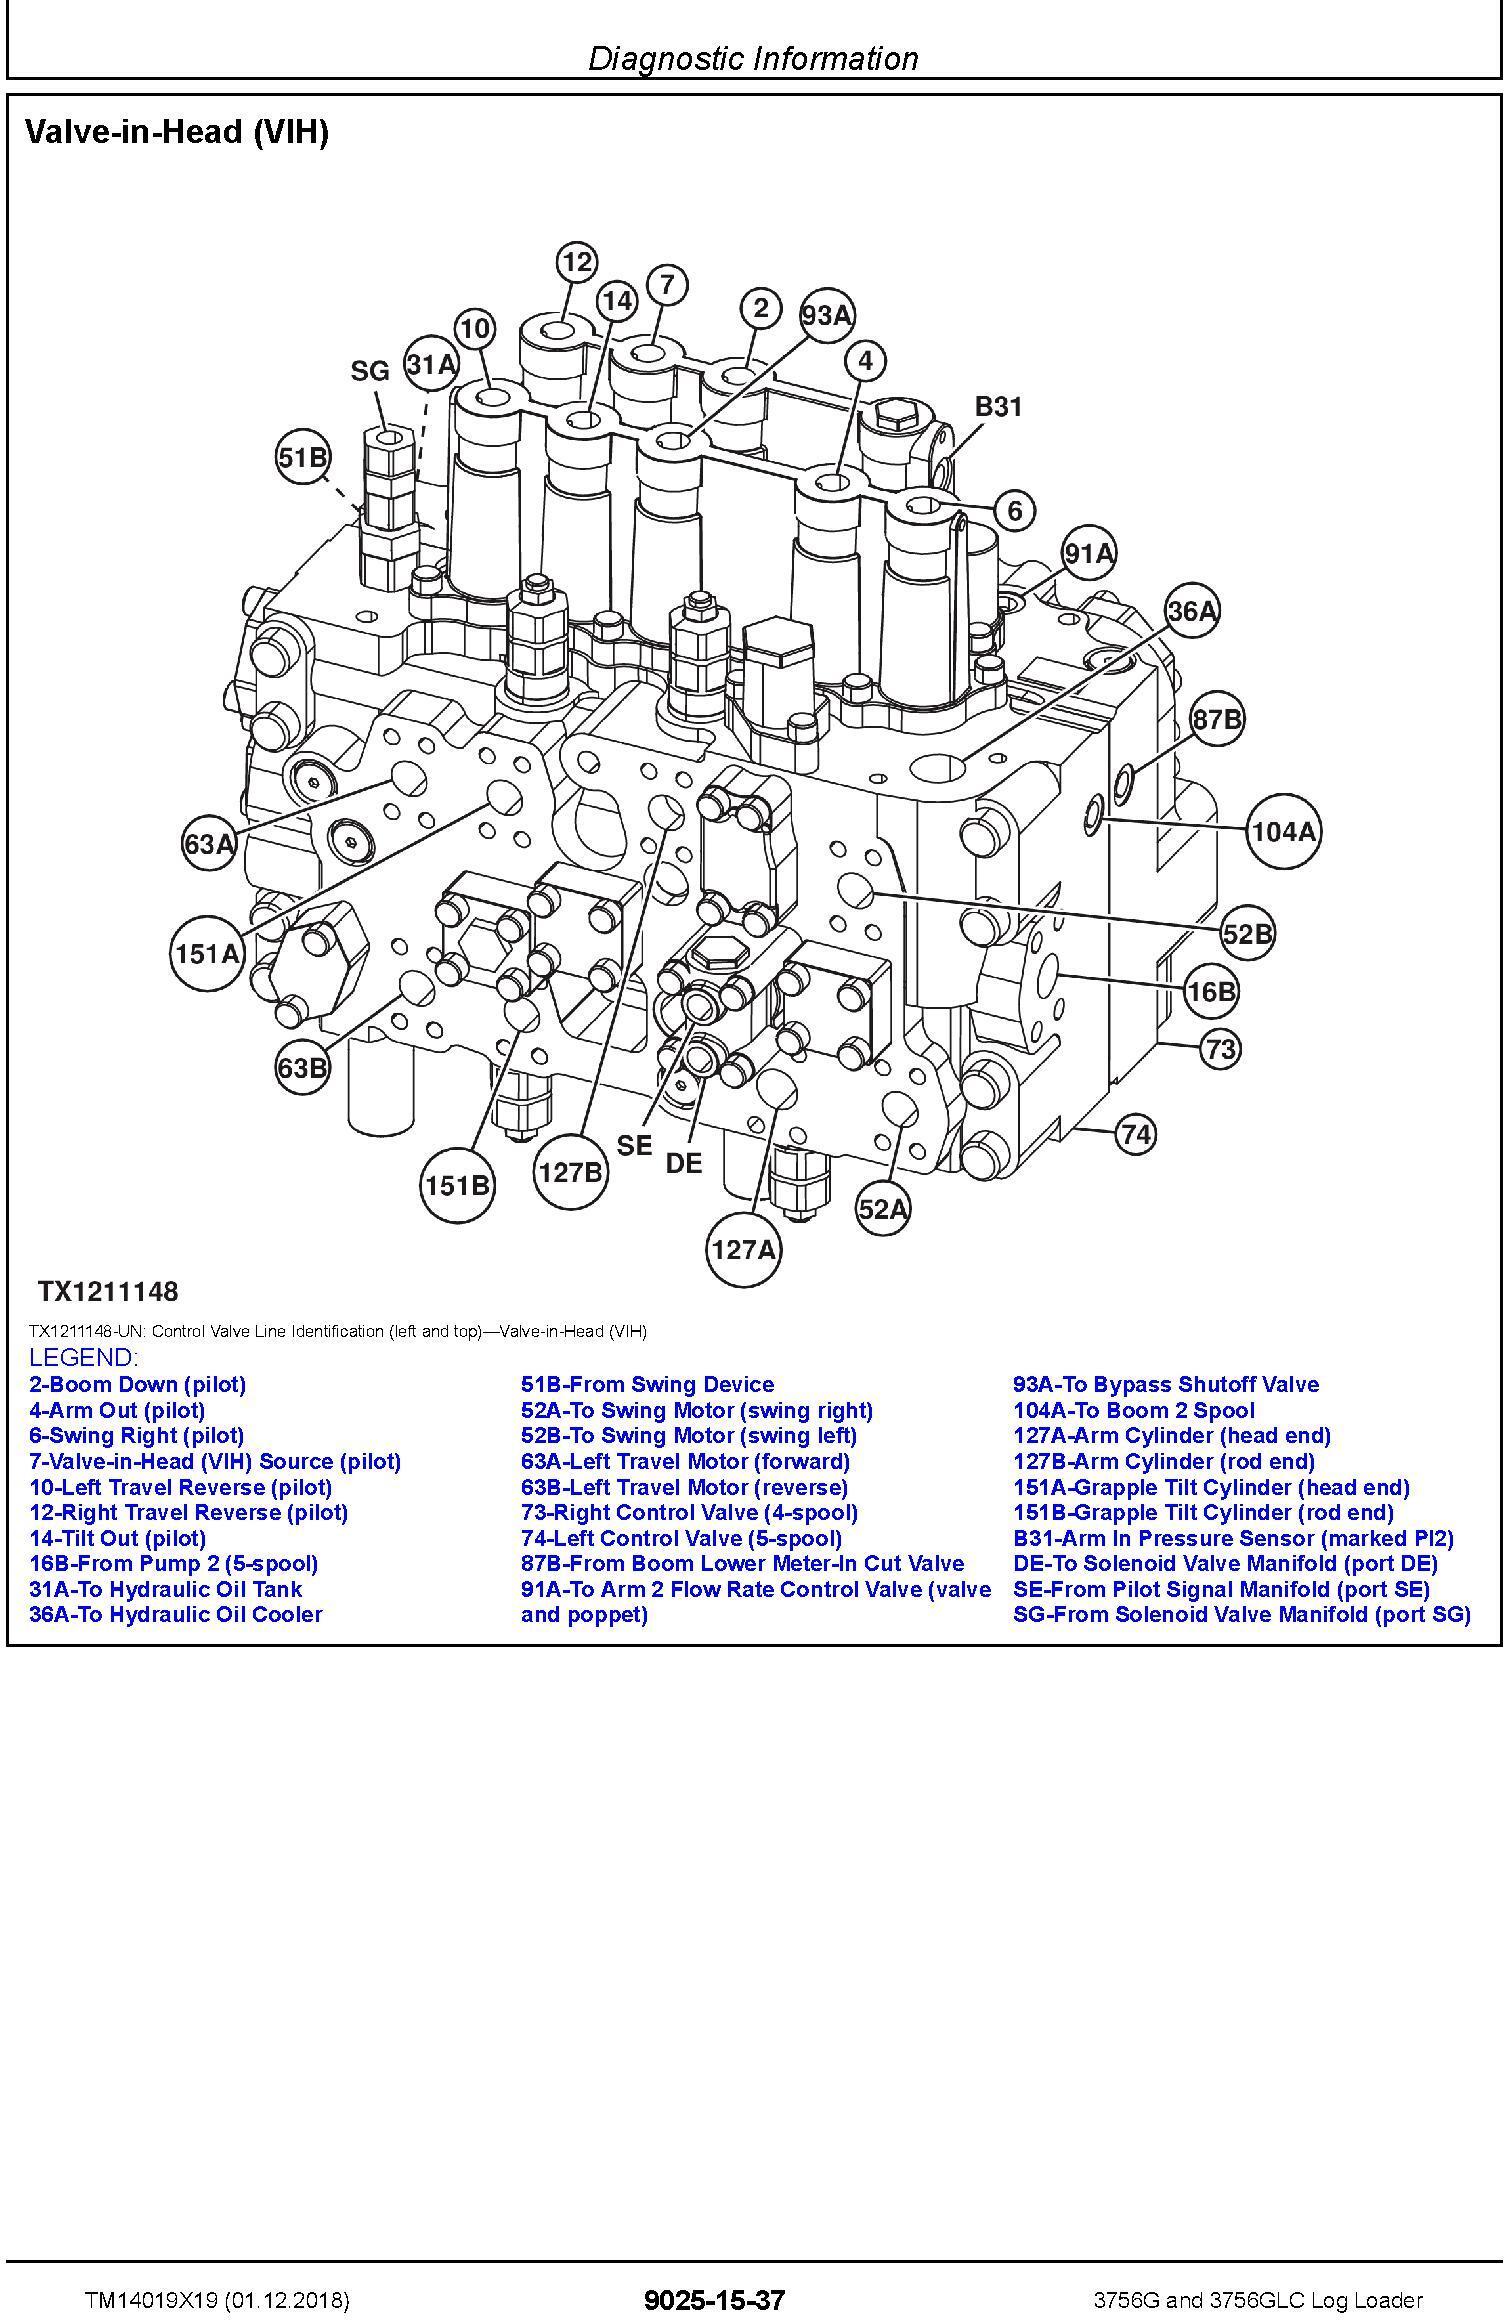 John Deere 3756G, 3756GLC (SN. D376001-) Log Loader Operation & Test Technical Manual (TM14019X19) - 3